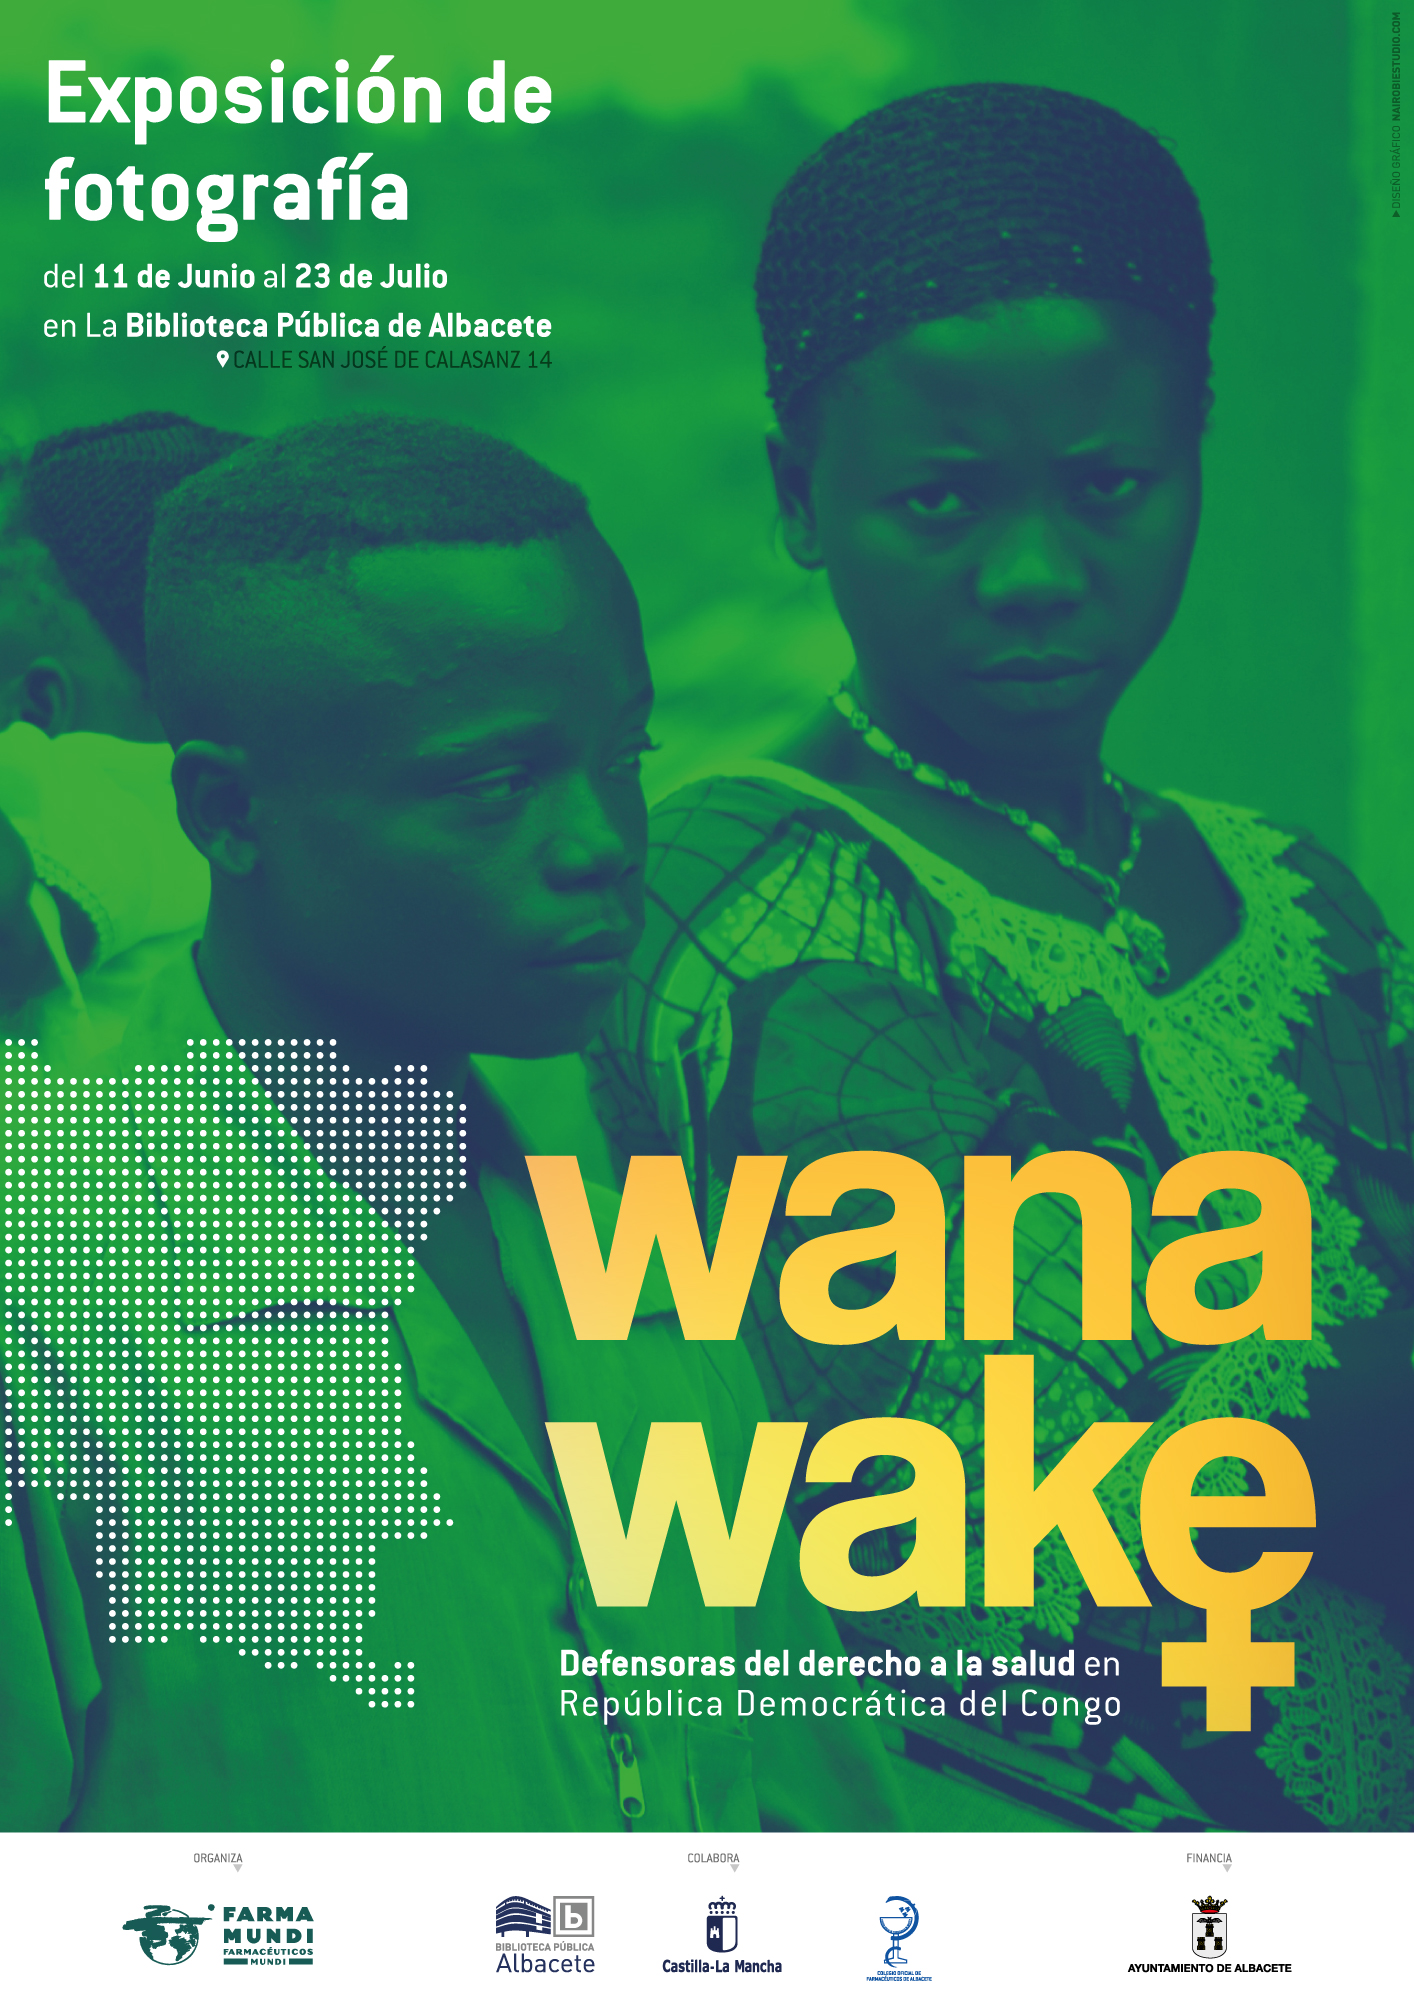 Farmamundi organiza la exposición fotográfica Wanawake en Albacete